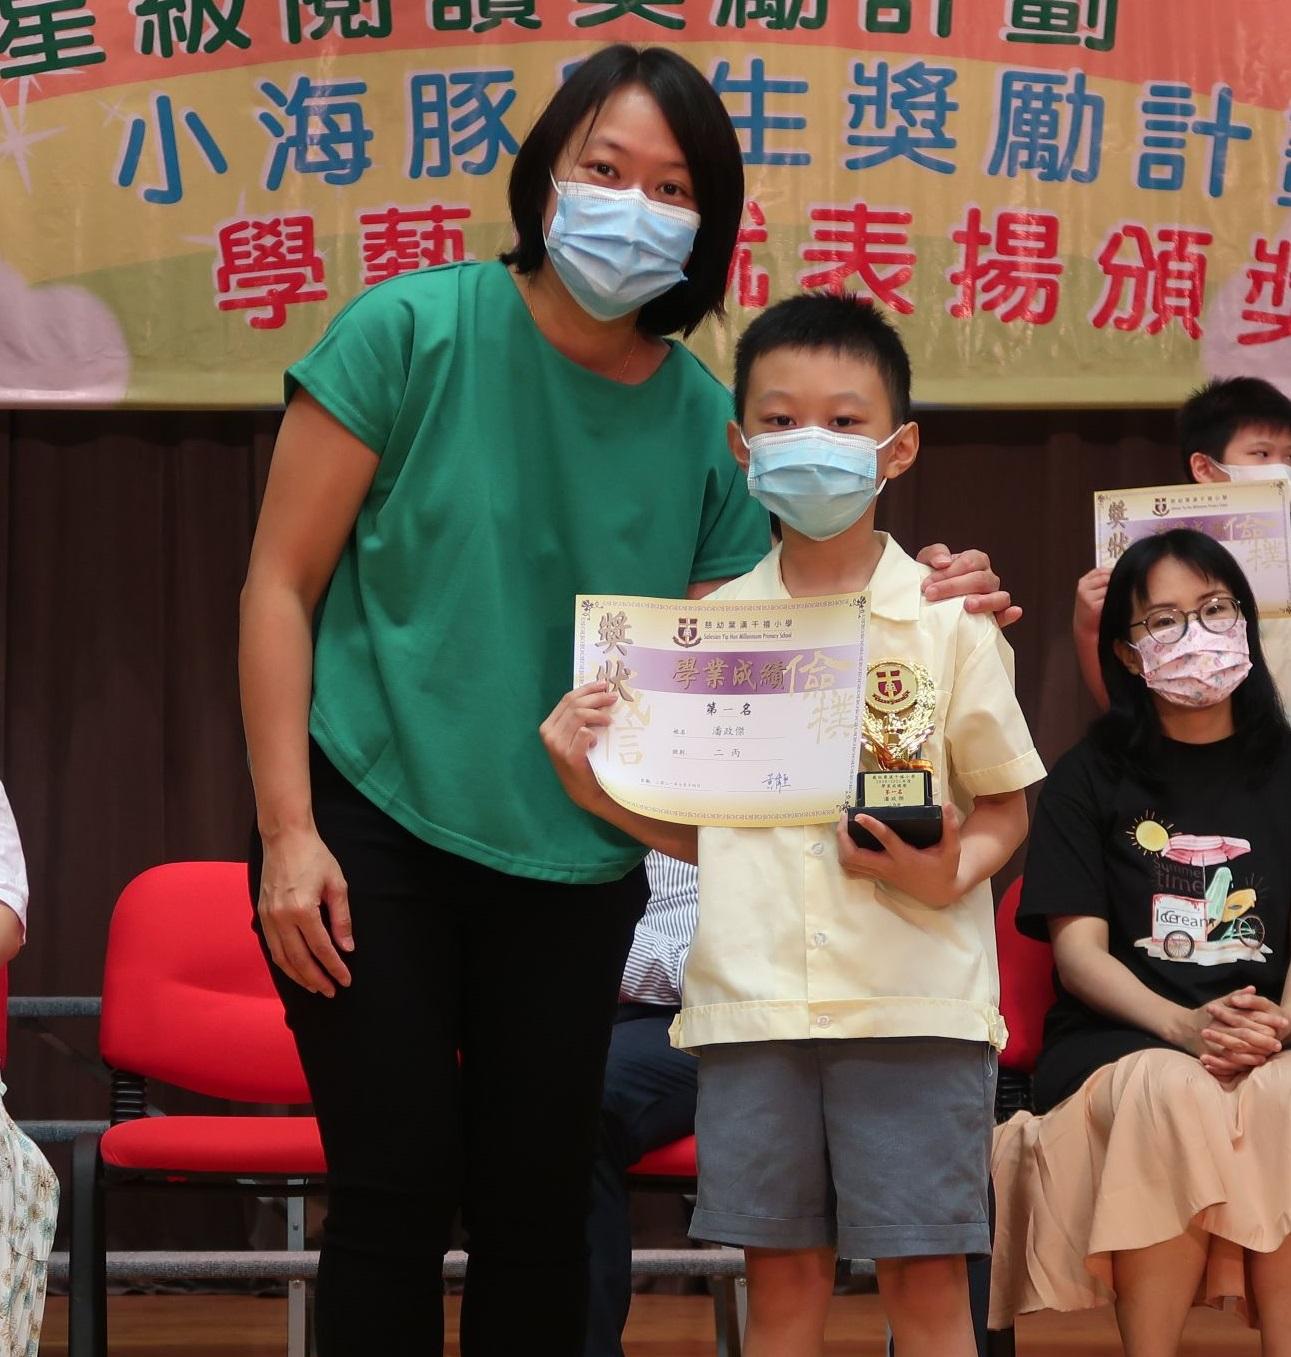 https://syh.edu.hk/sites/default/files/img_5409.jpg